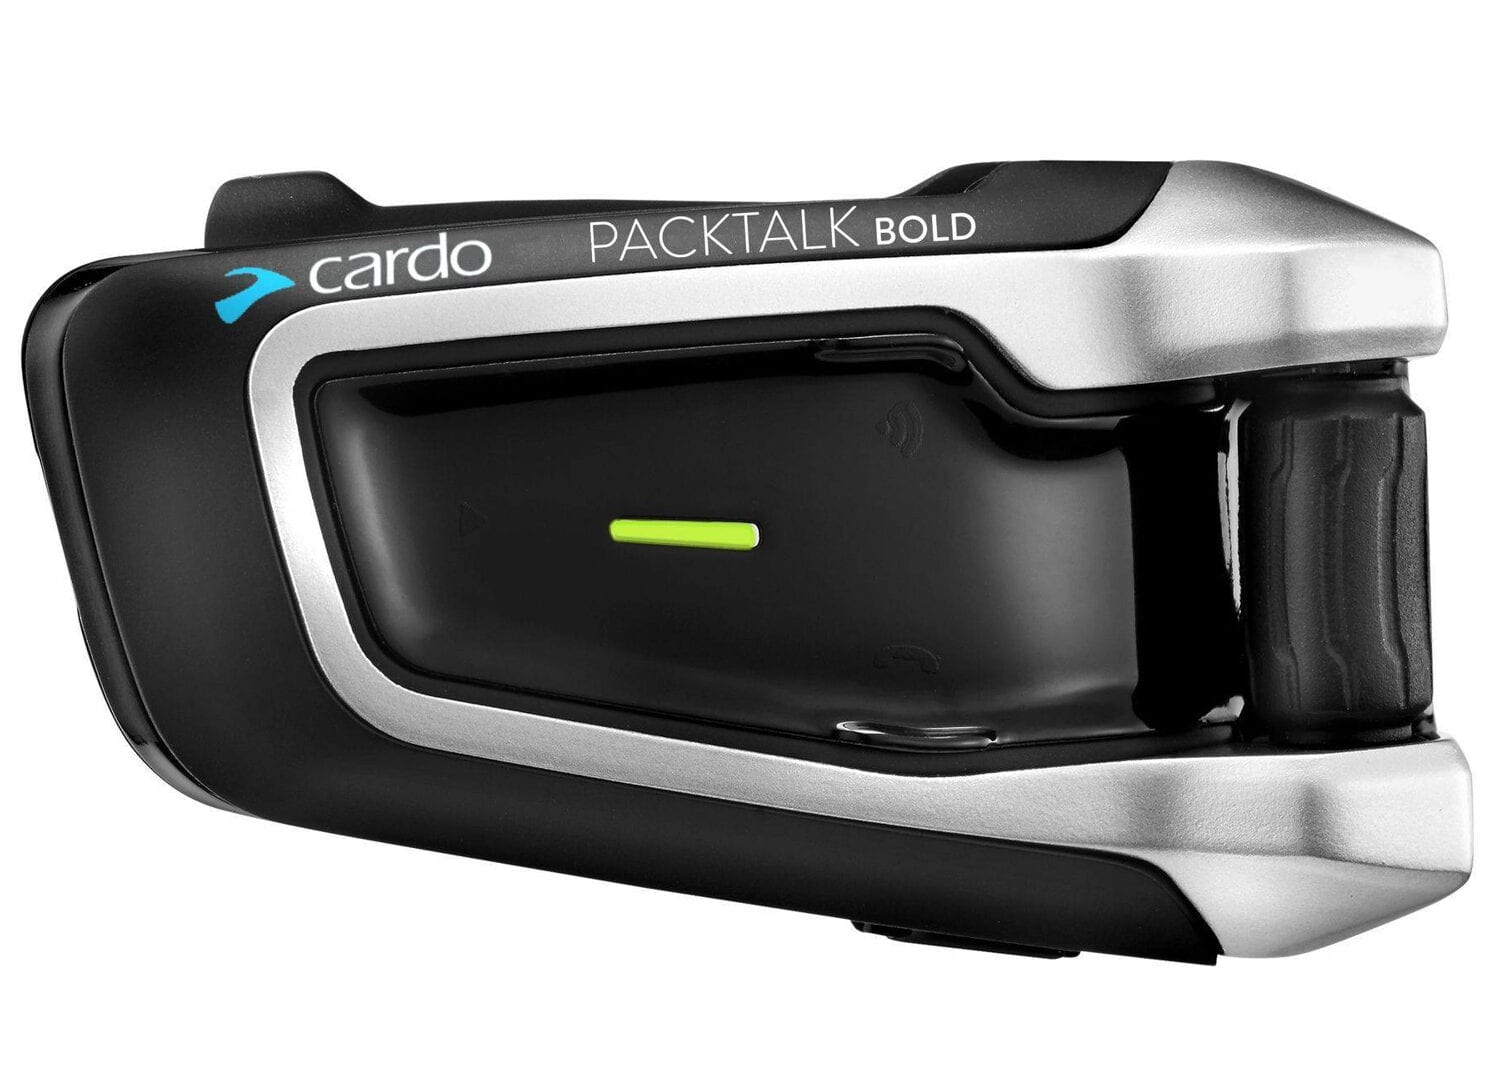 Packtalk Bold From Cardo